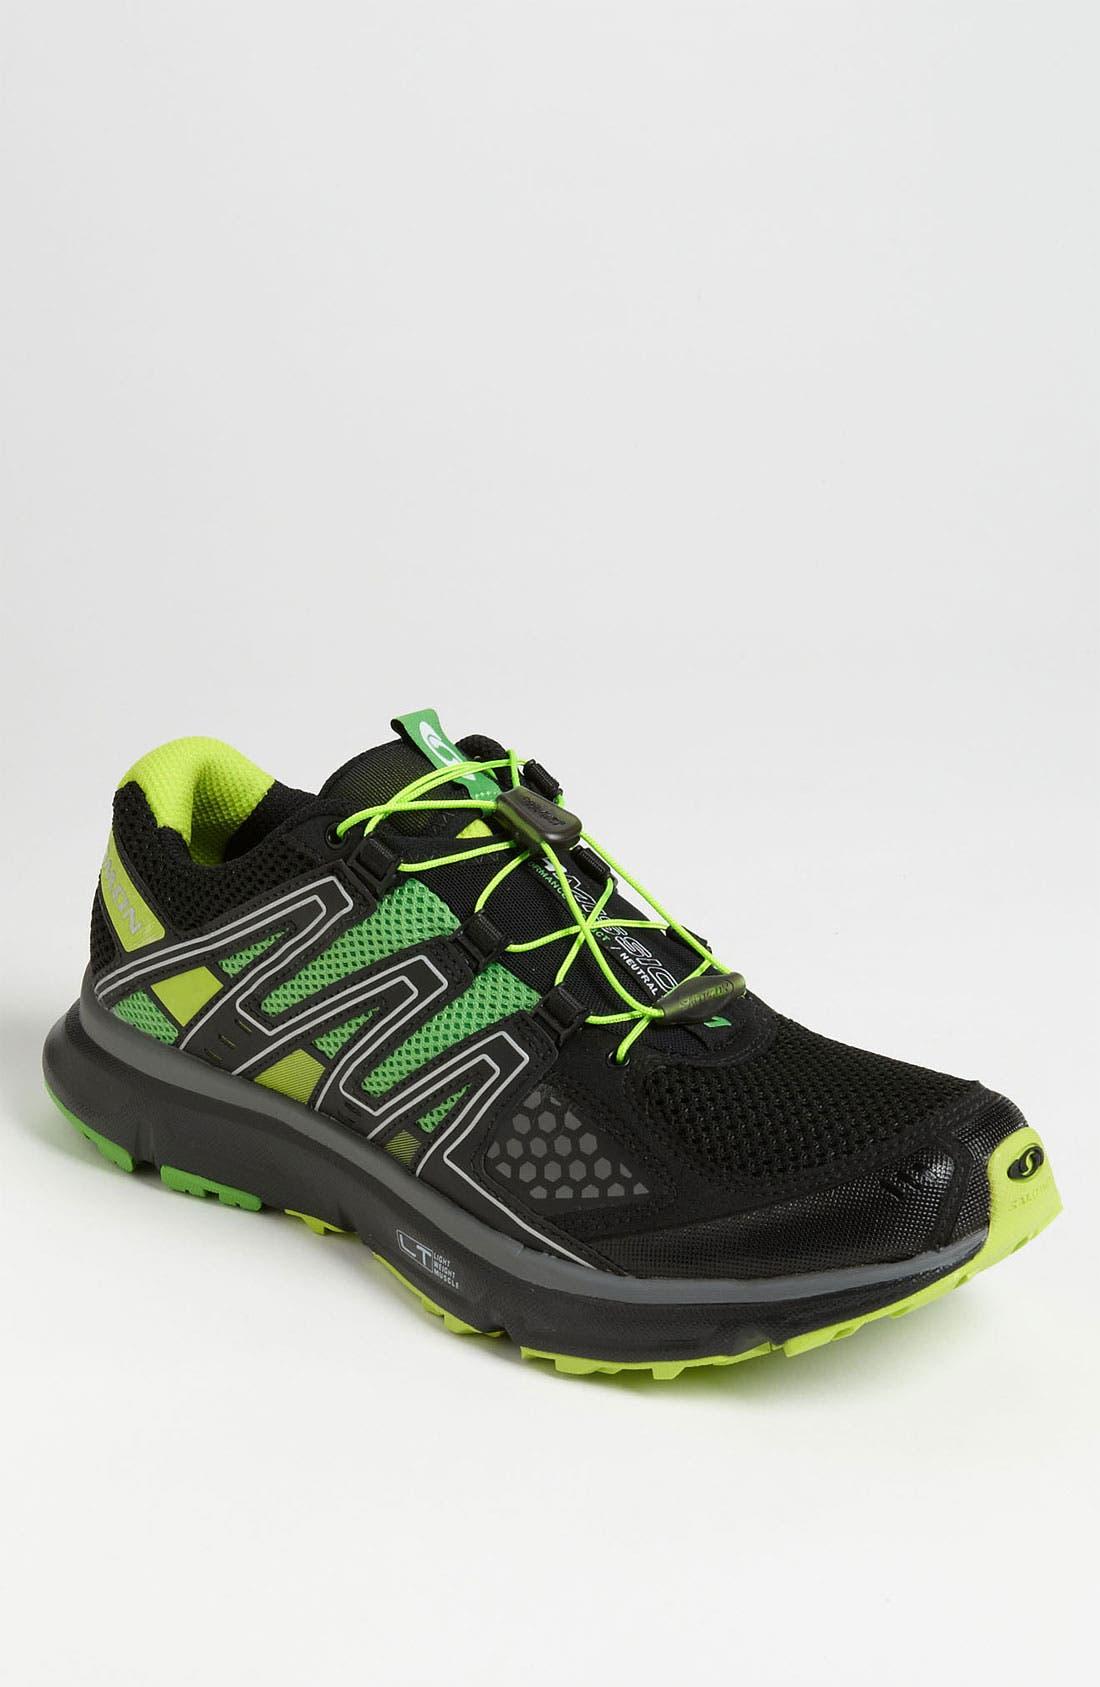 Alternate Image 1 Selected - Salomon 'XR Mission' Trail Running Shoe (Men)